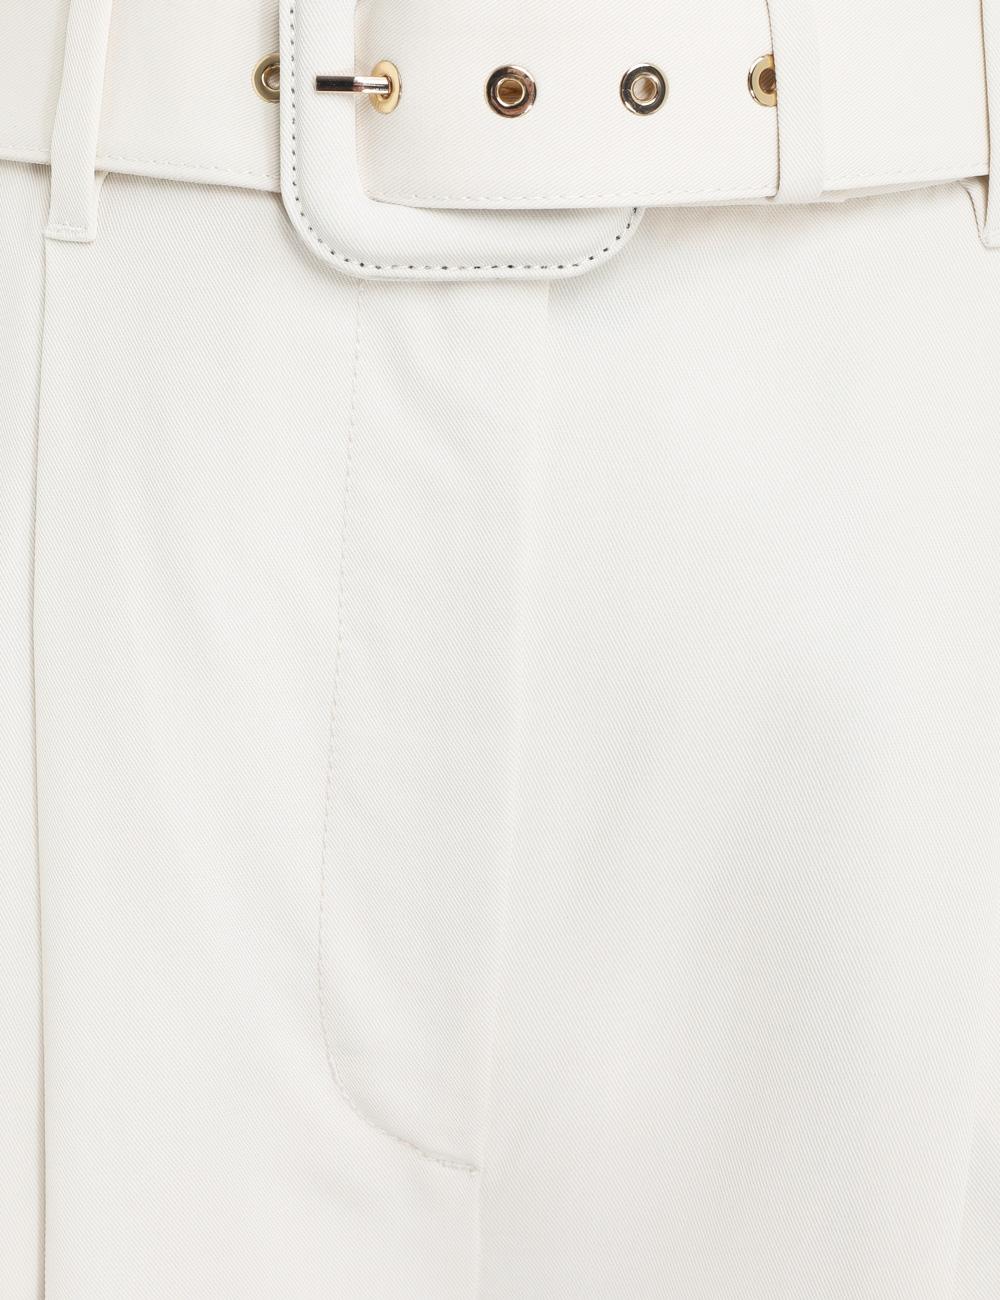 Botanica Man Style Trouser